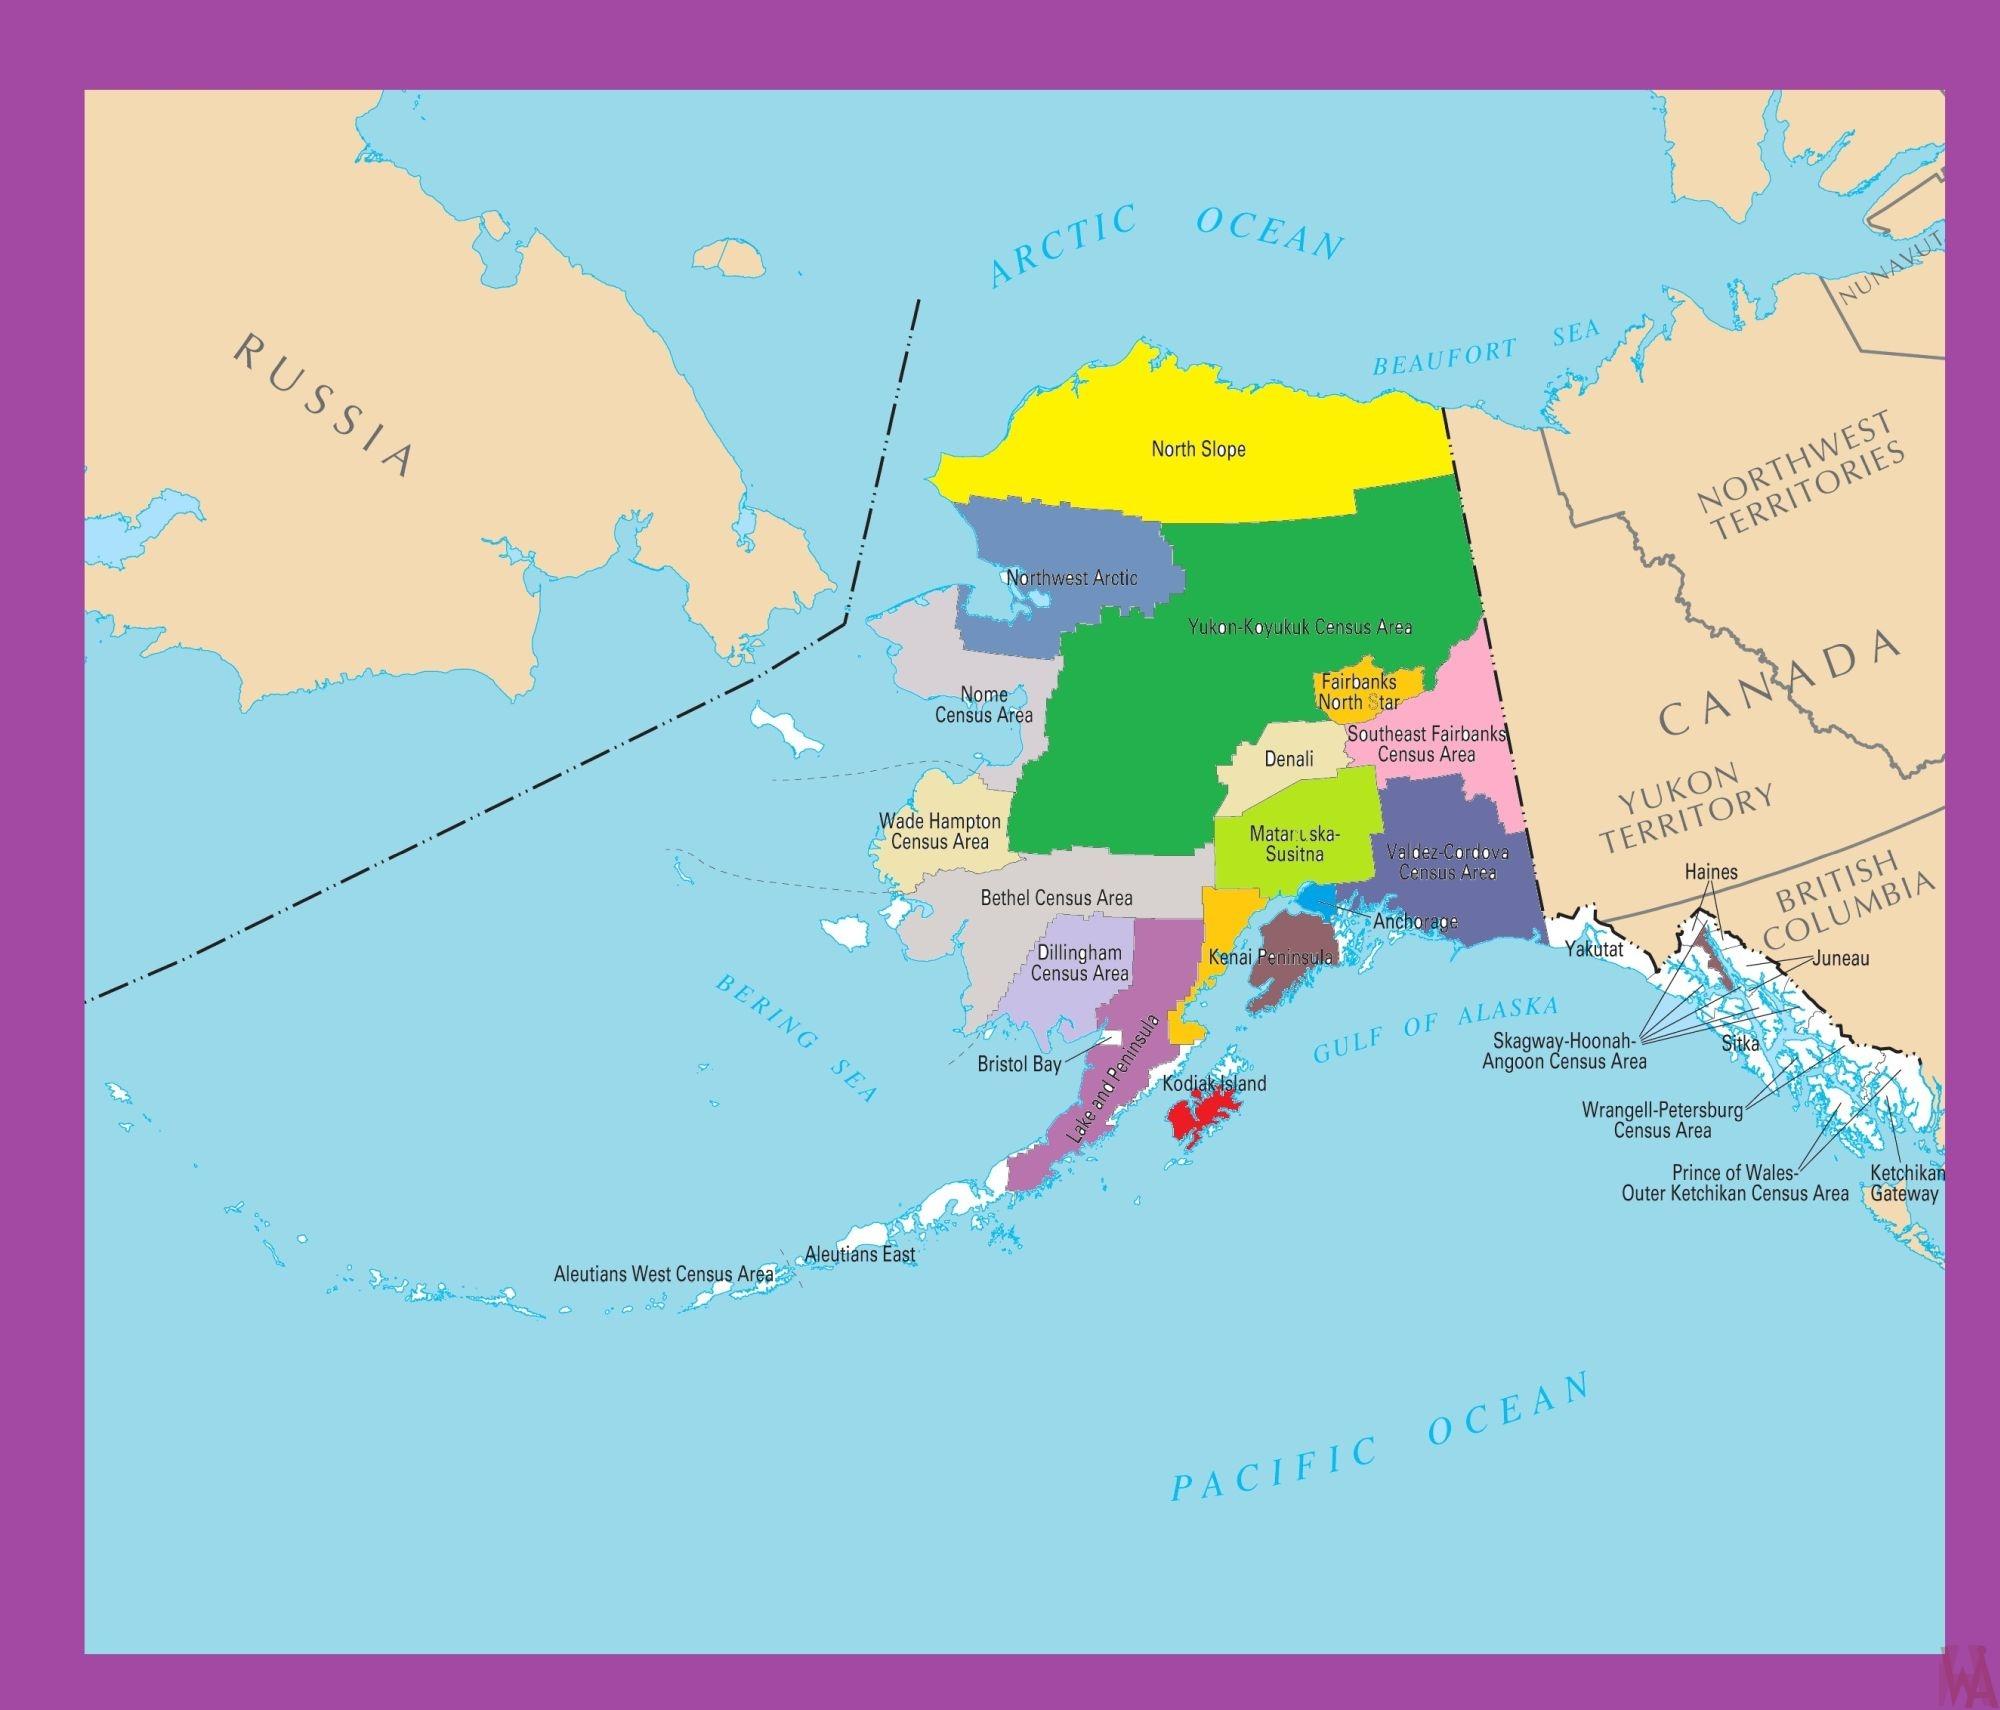 Alaska Color County Map |  Color County Map of Alaska -2